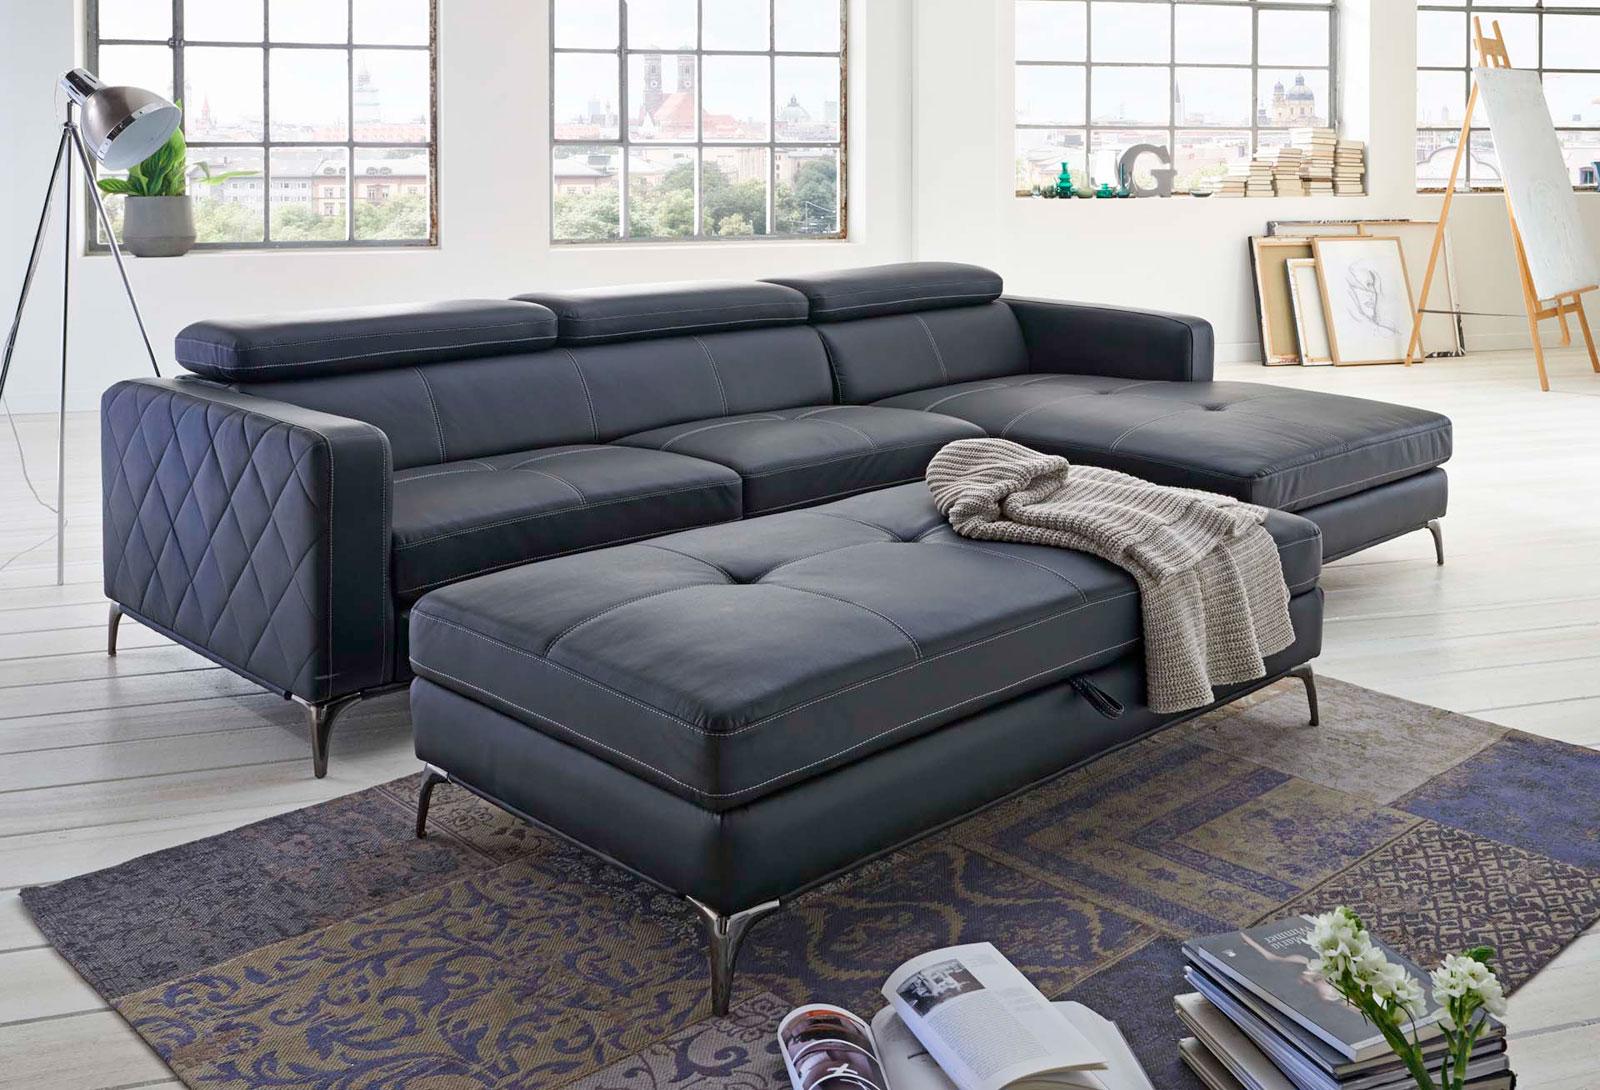 sam schlafsofa anthrazit dario ecksofa rechts auf lager. Black Bedroom Furniture Sets. Home Design Ideas